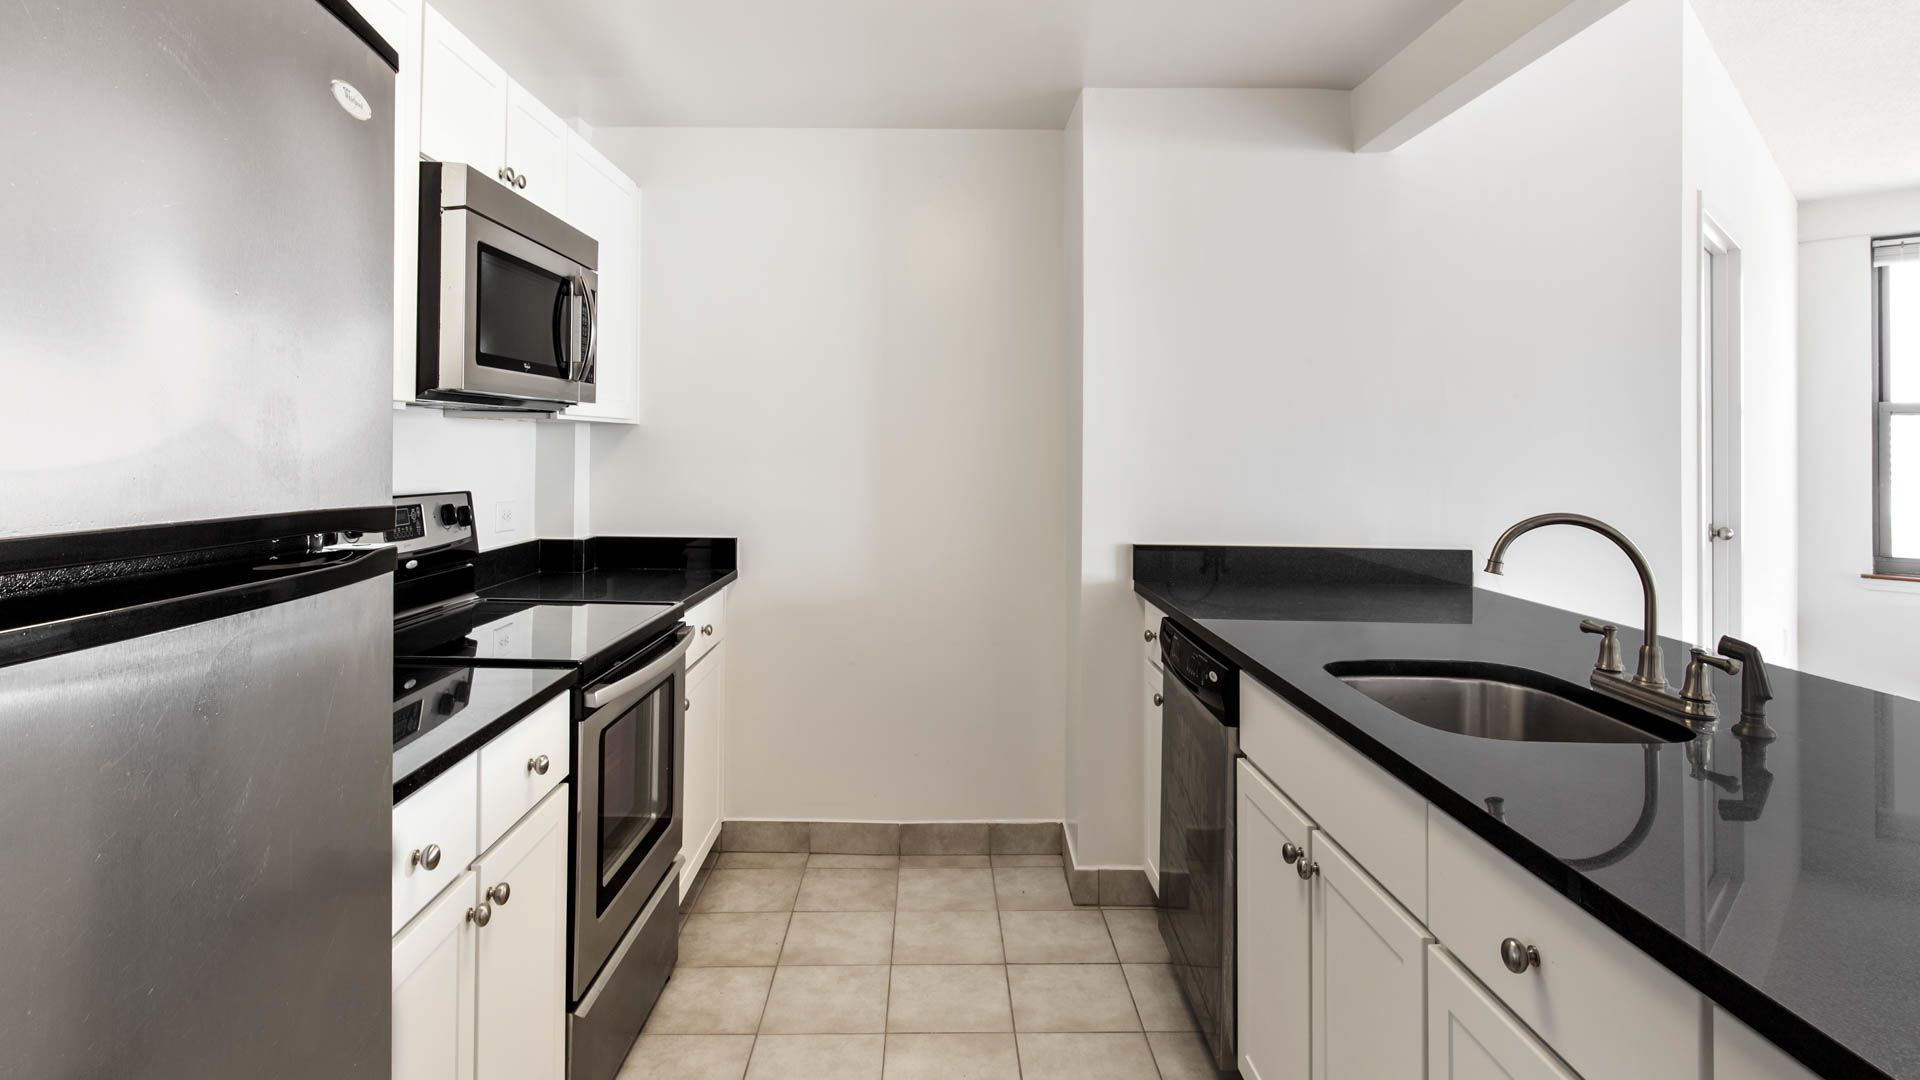 Portside Towers Apartments   Downtown Jersey City   155 Washington Street |  EquityApartments.com